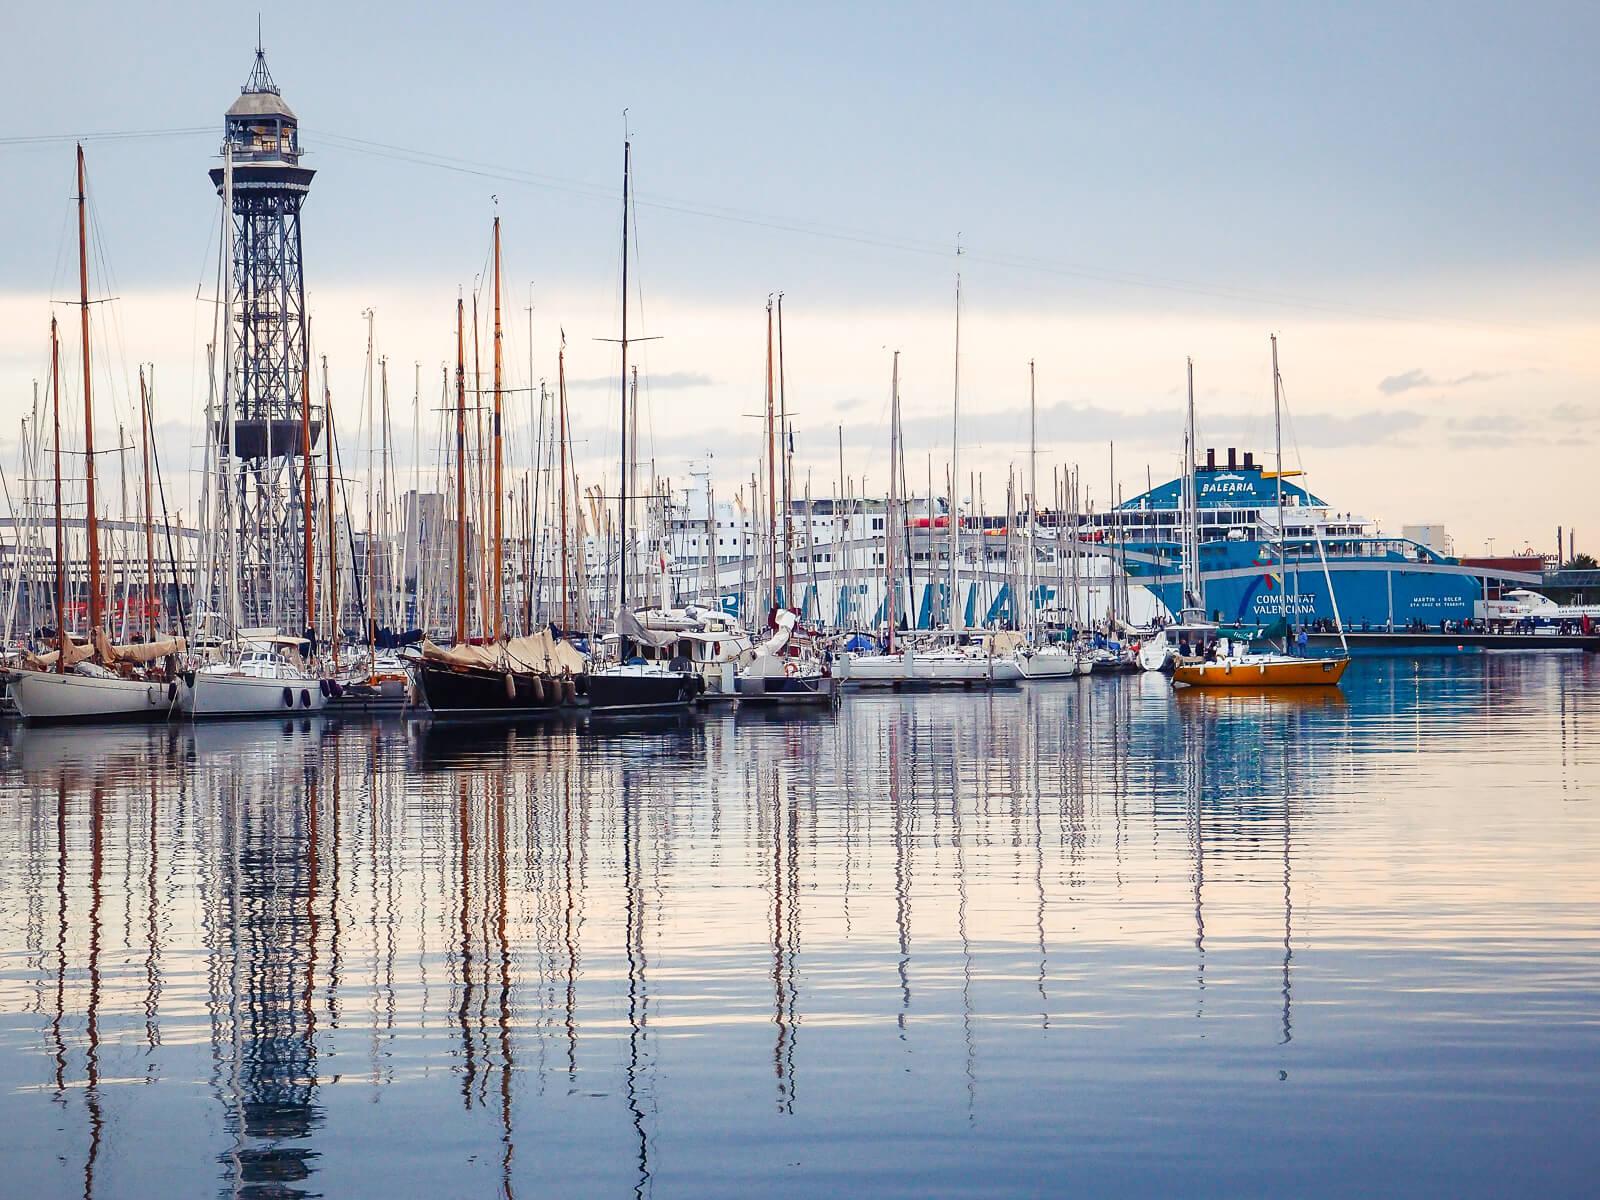 Barcelona Street Photography, calm water, mast pole reflexions, yacht port